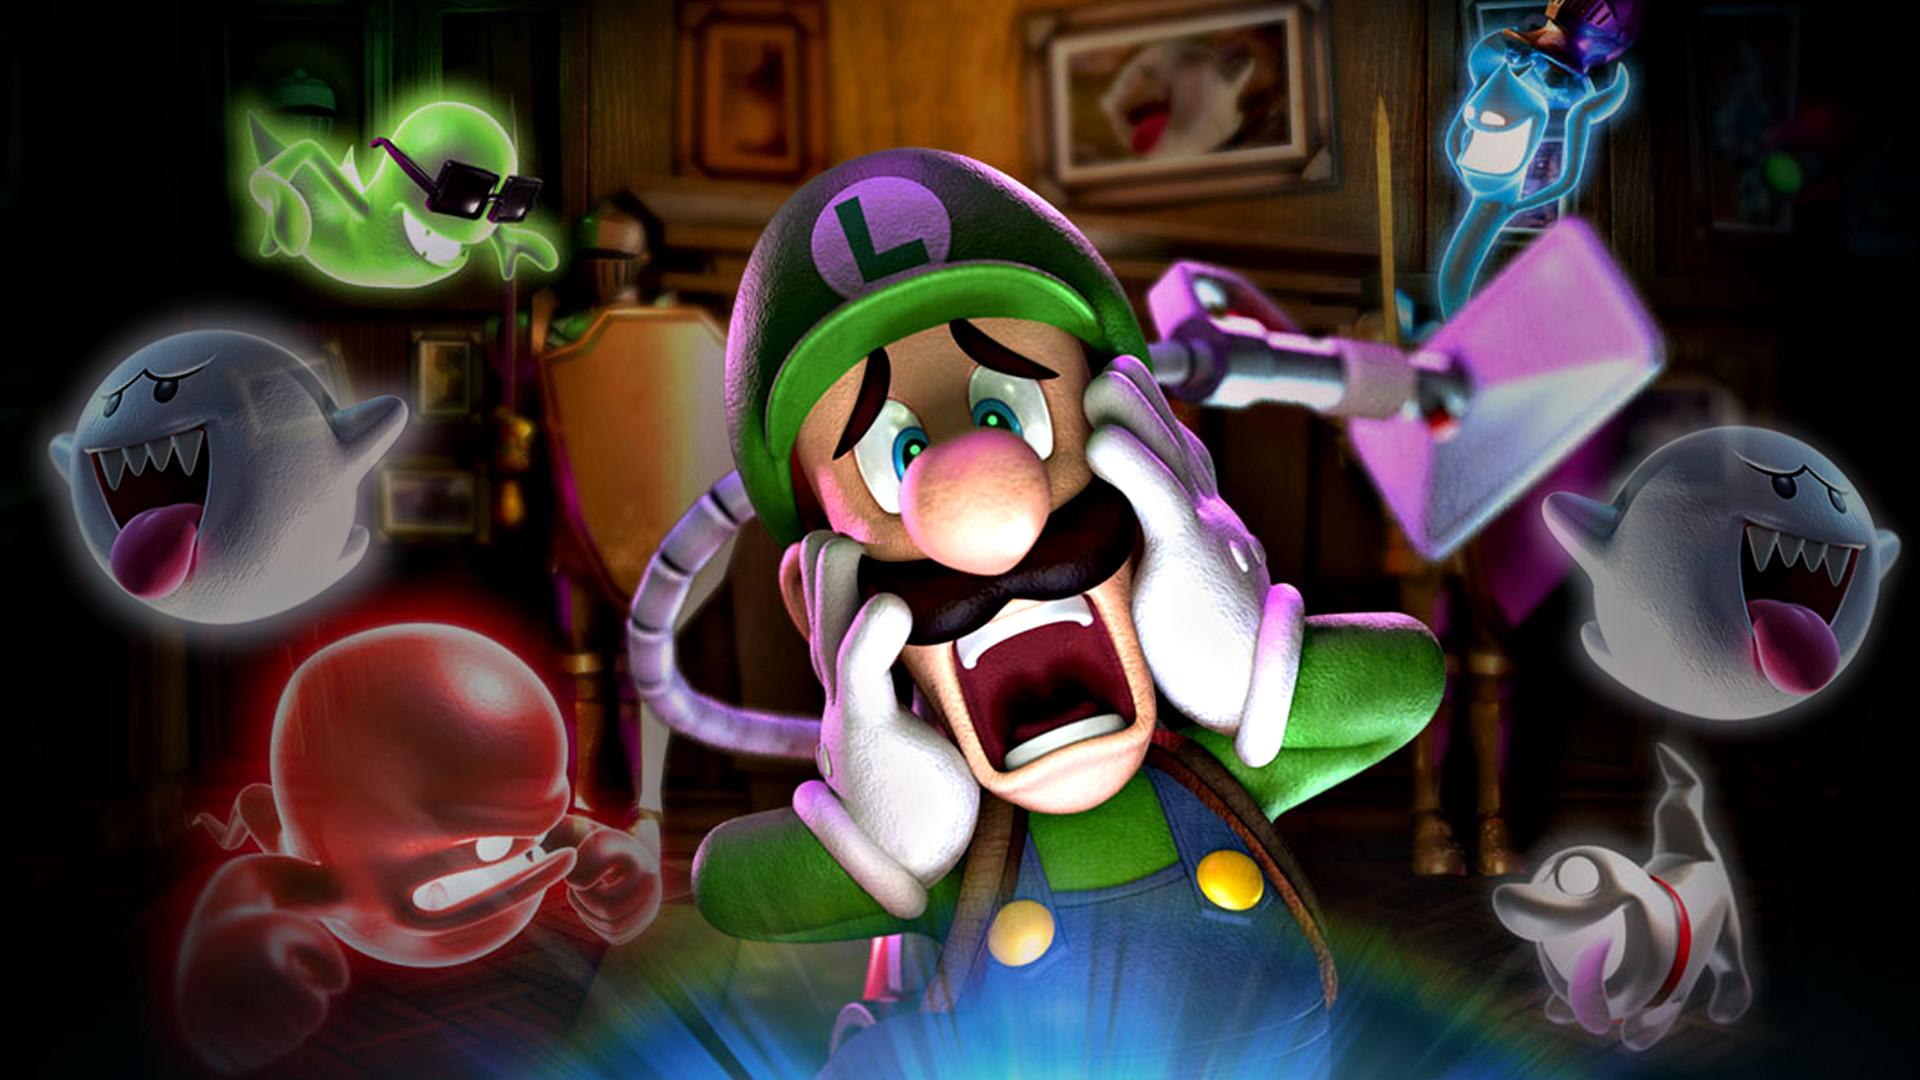 Luigi's Mansion 2 (Dark Moon) HD Wallpaper by Louie82Y on DeviantArt